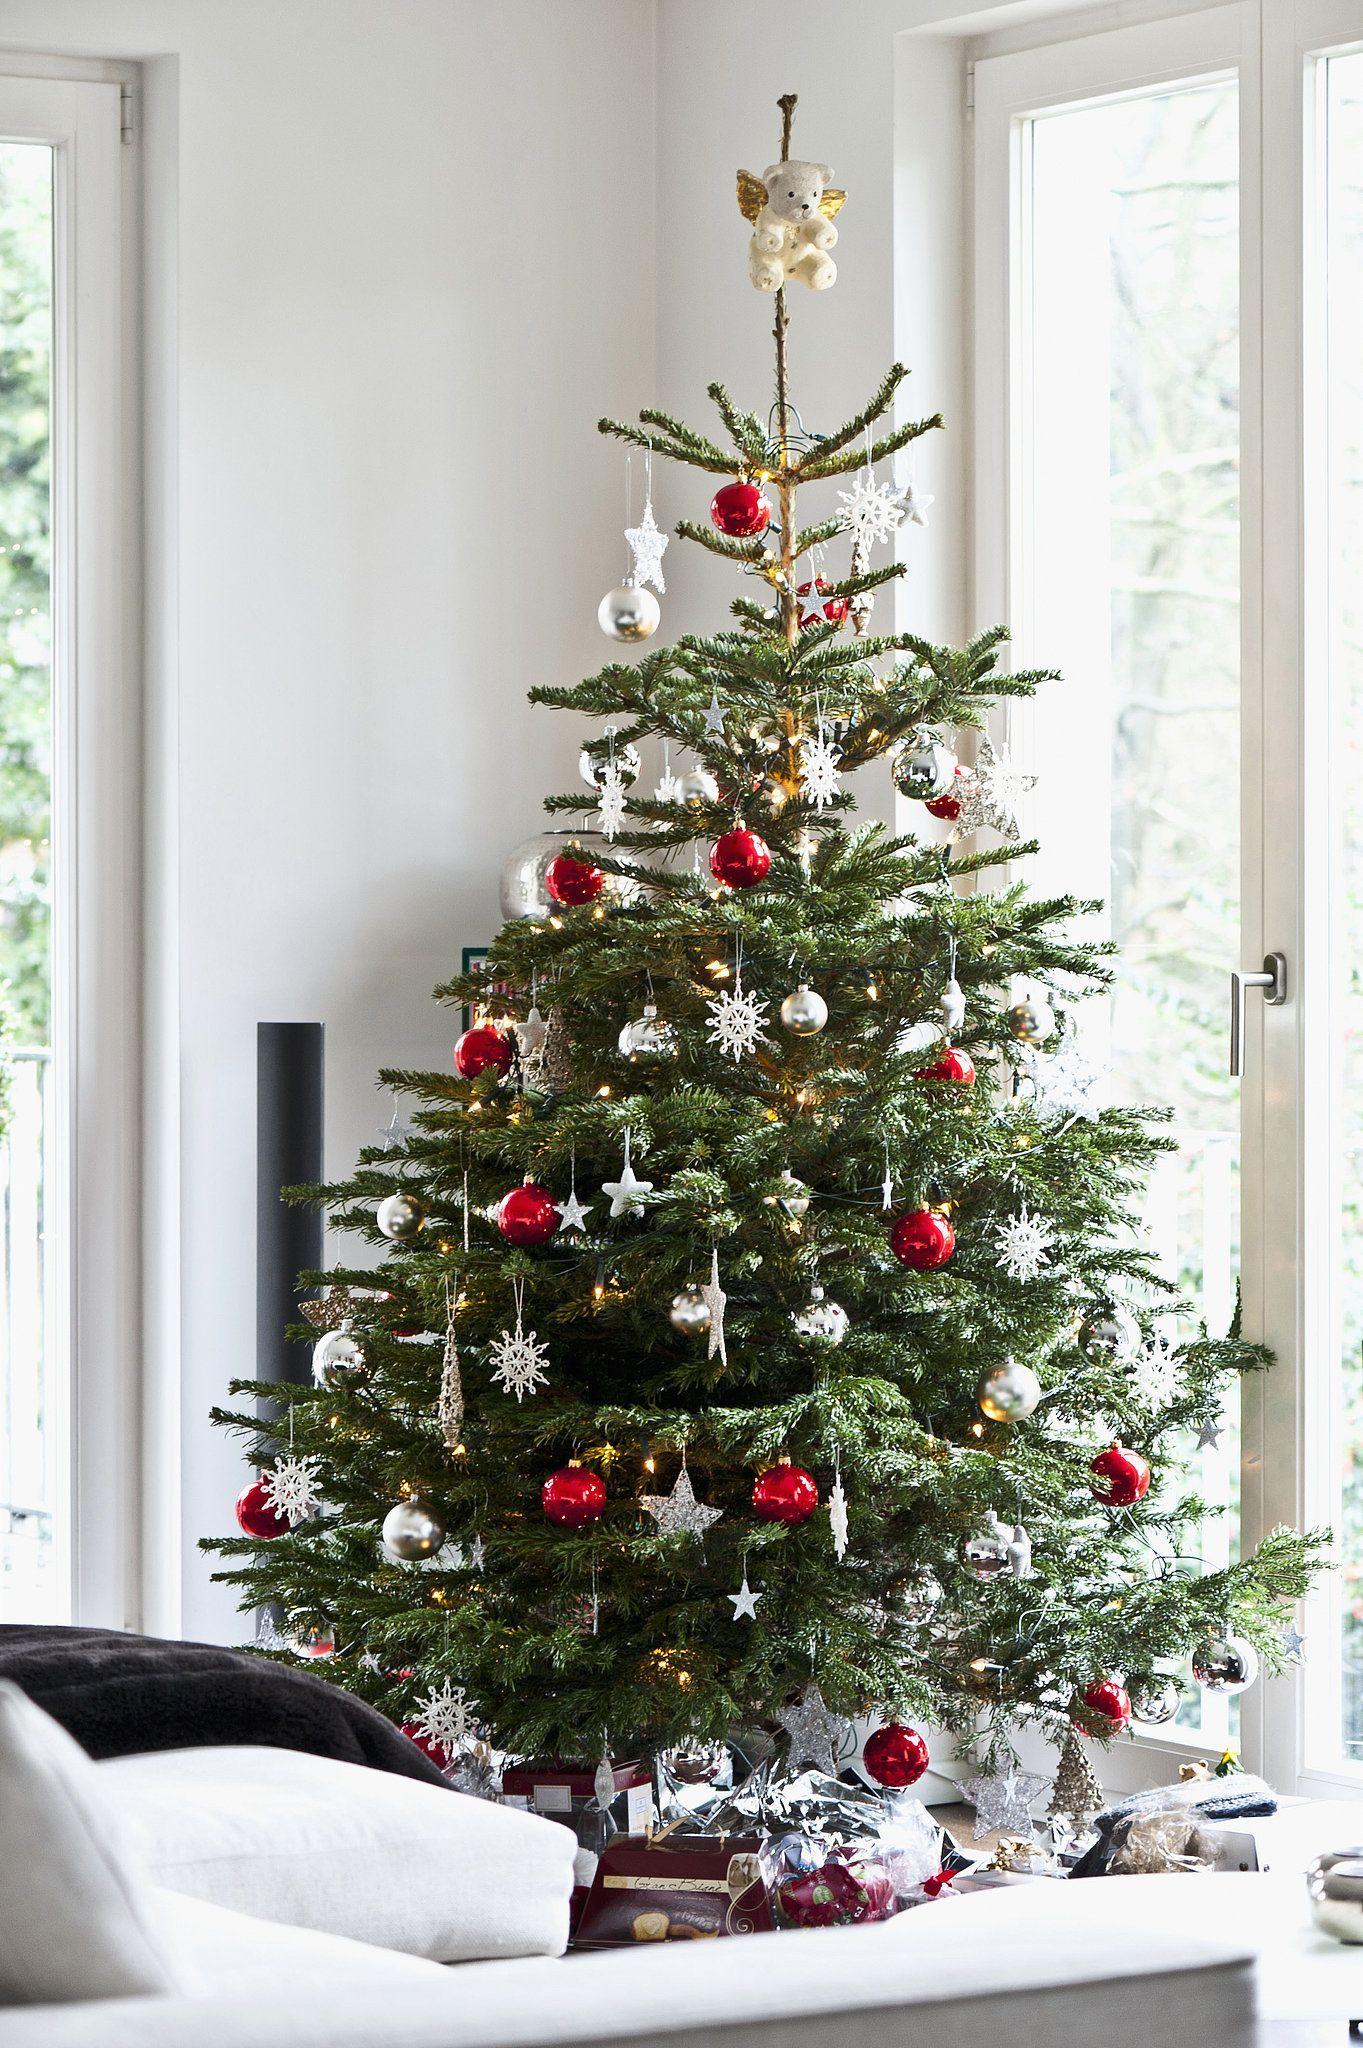 11 Tips For Decorating Your Holiday Tree Like A Pro Scandinavian Christmas Trees Cheap Christmas Trees Real Christmas Tree